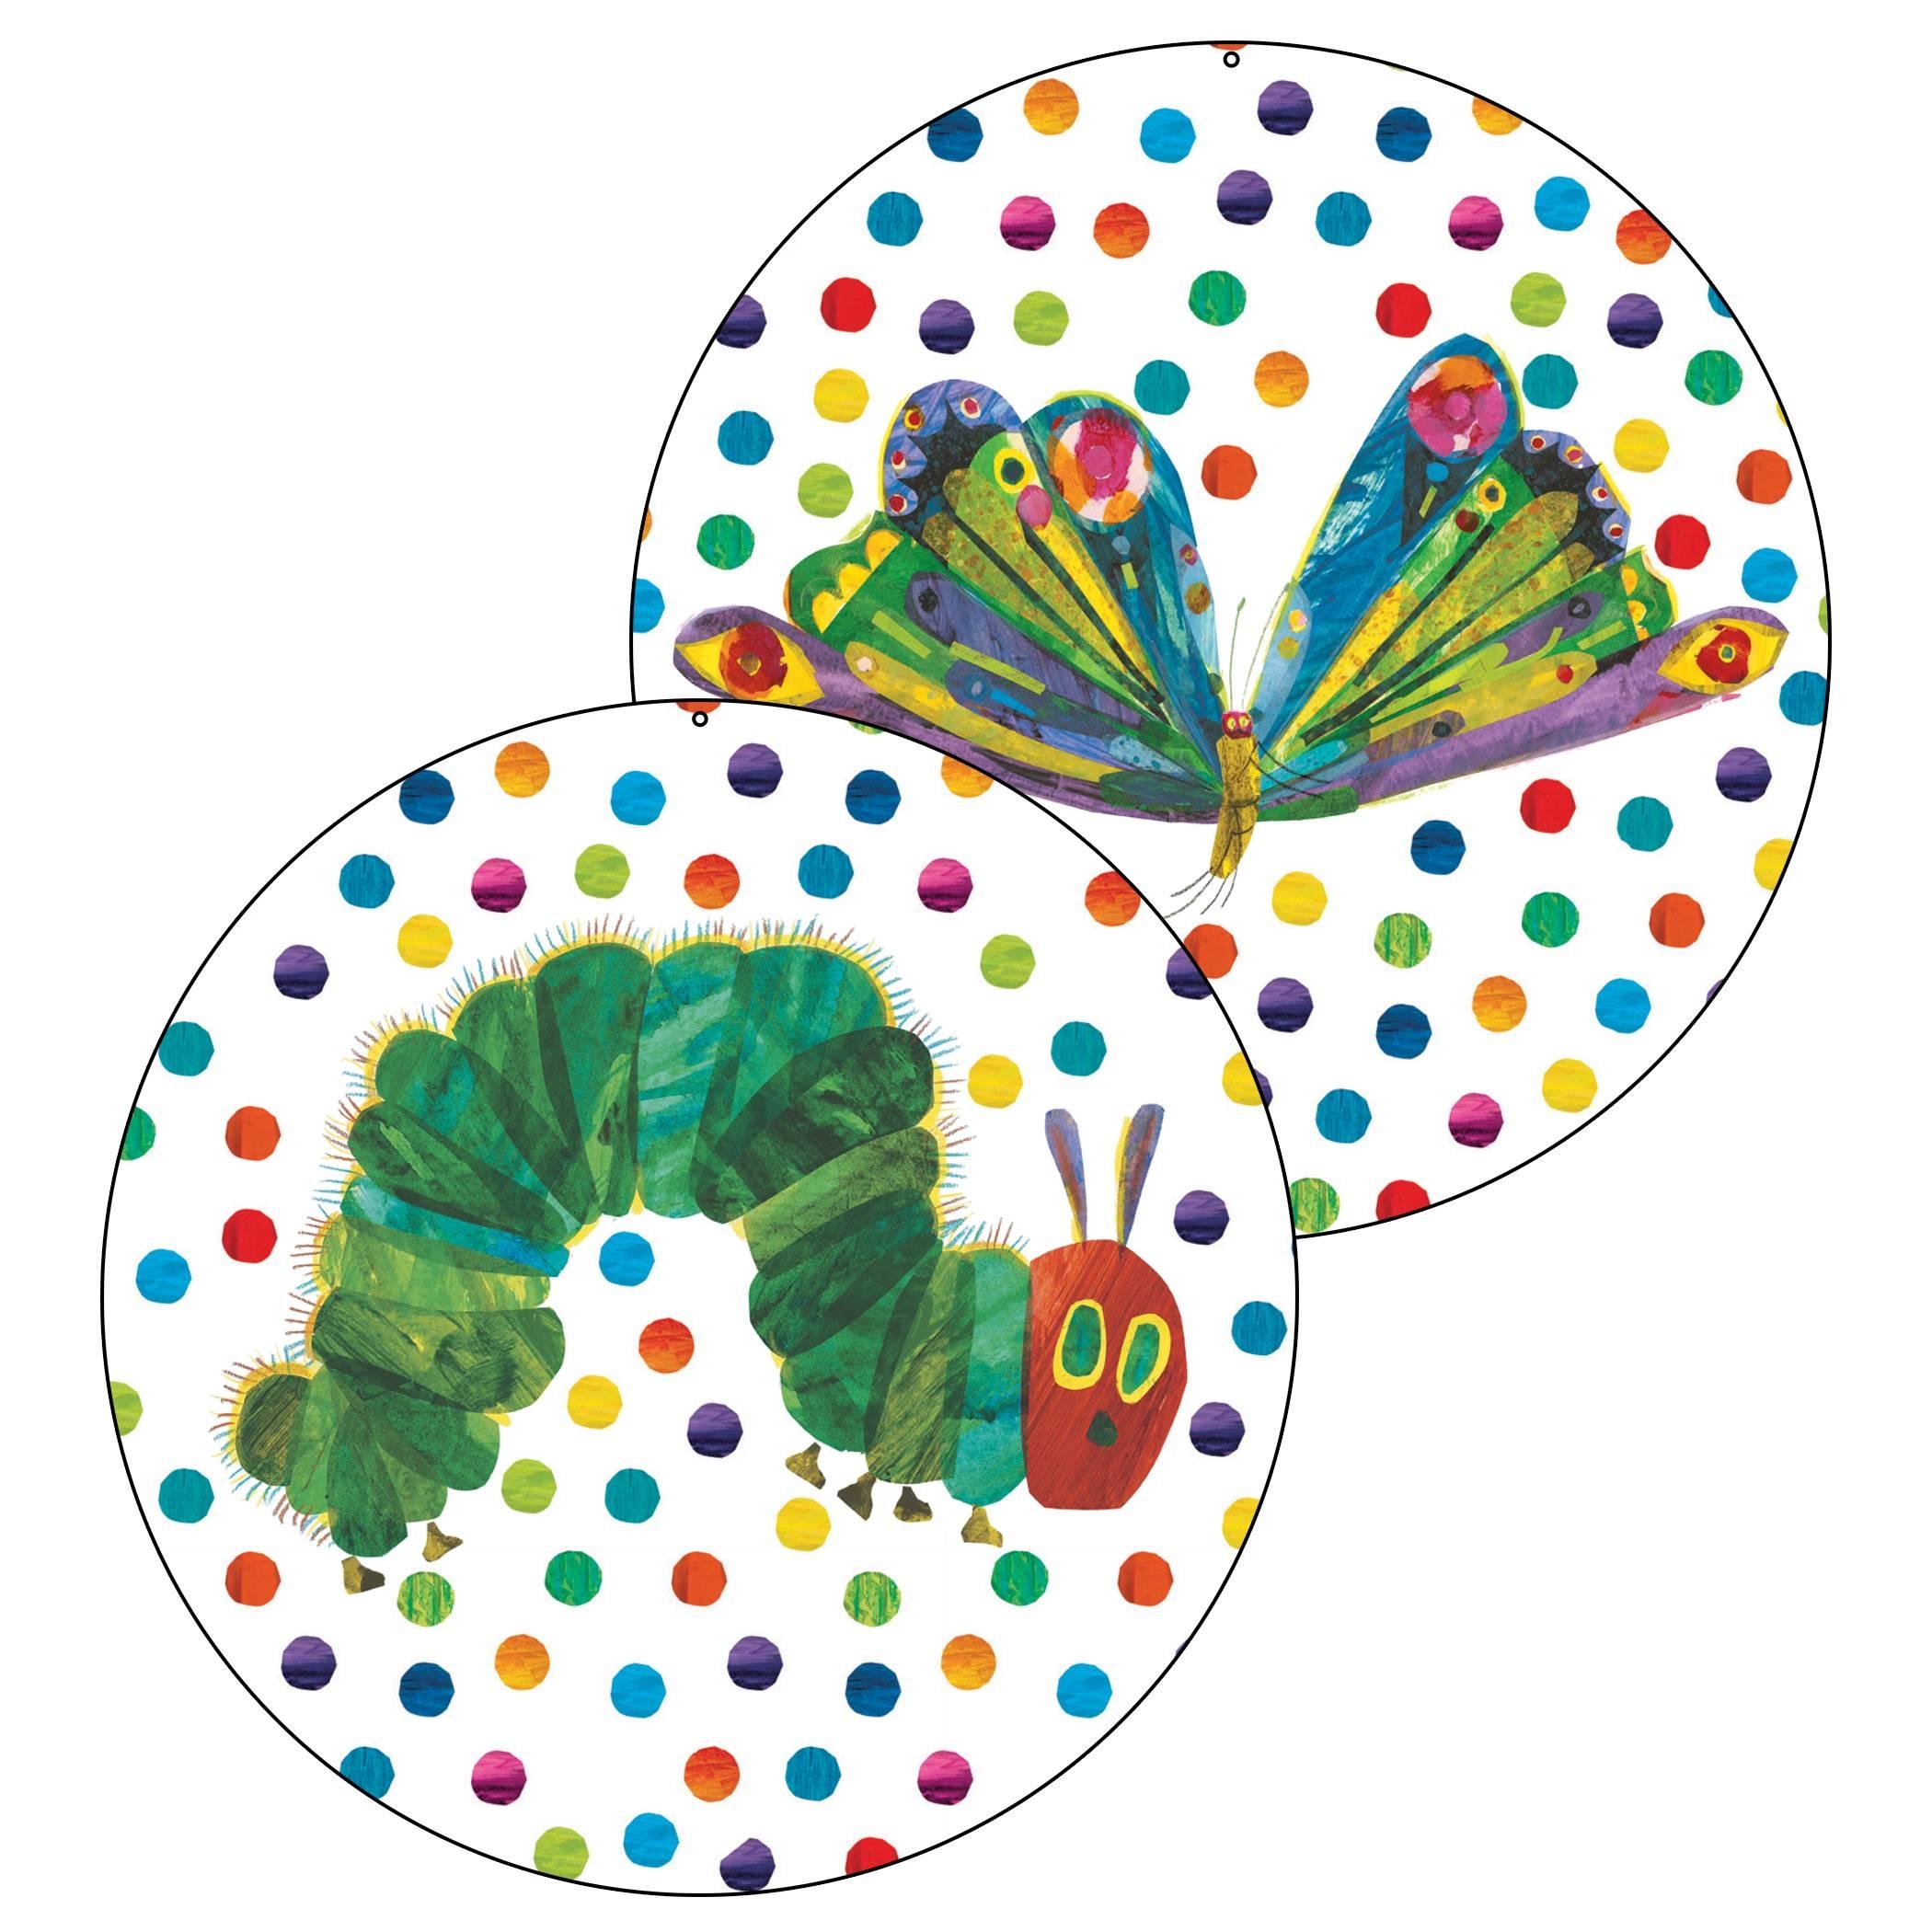 Very Hungry Caterpillar Jumbo Circle Decoration | The Eric Carle for 2018 The Very Hungry Caterpillar Wall Art